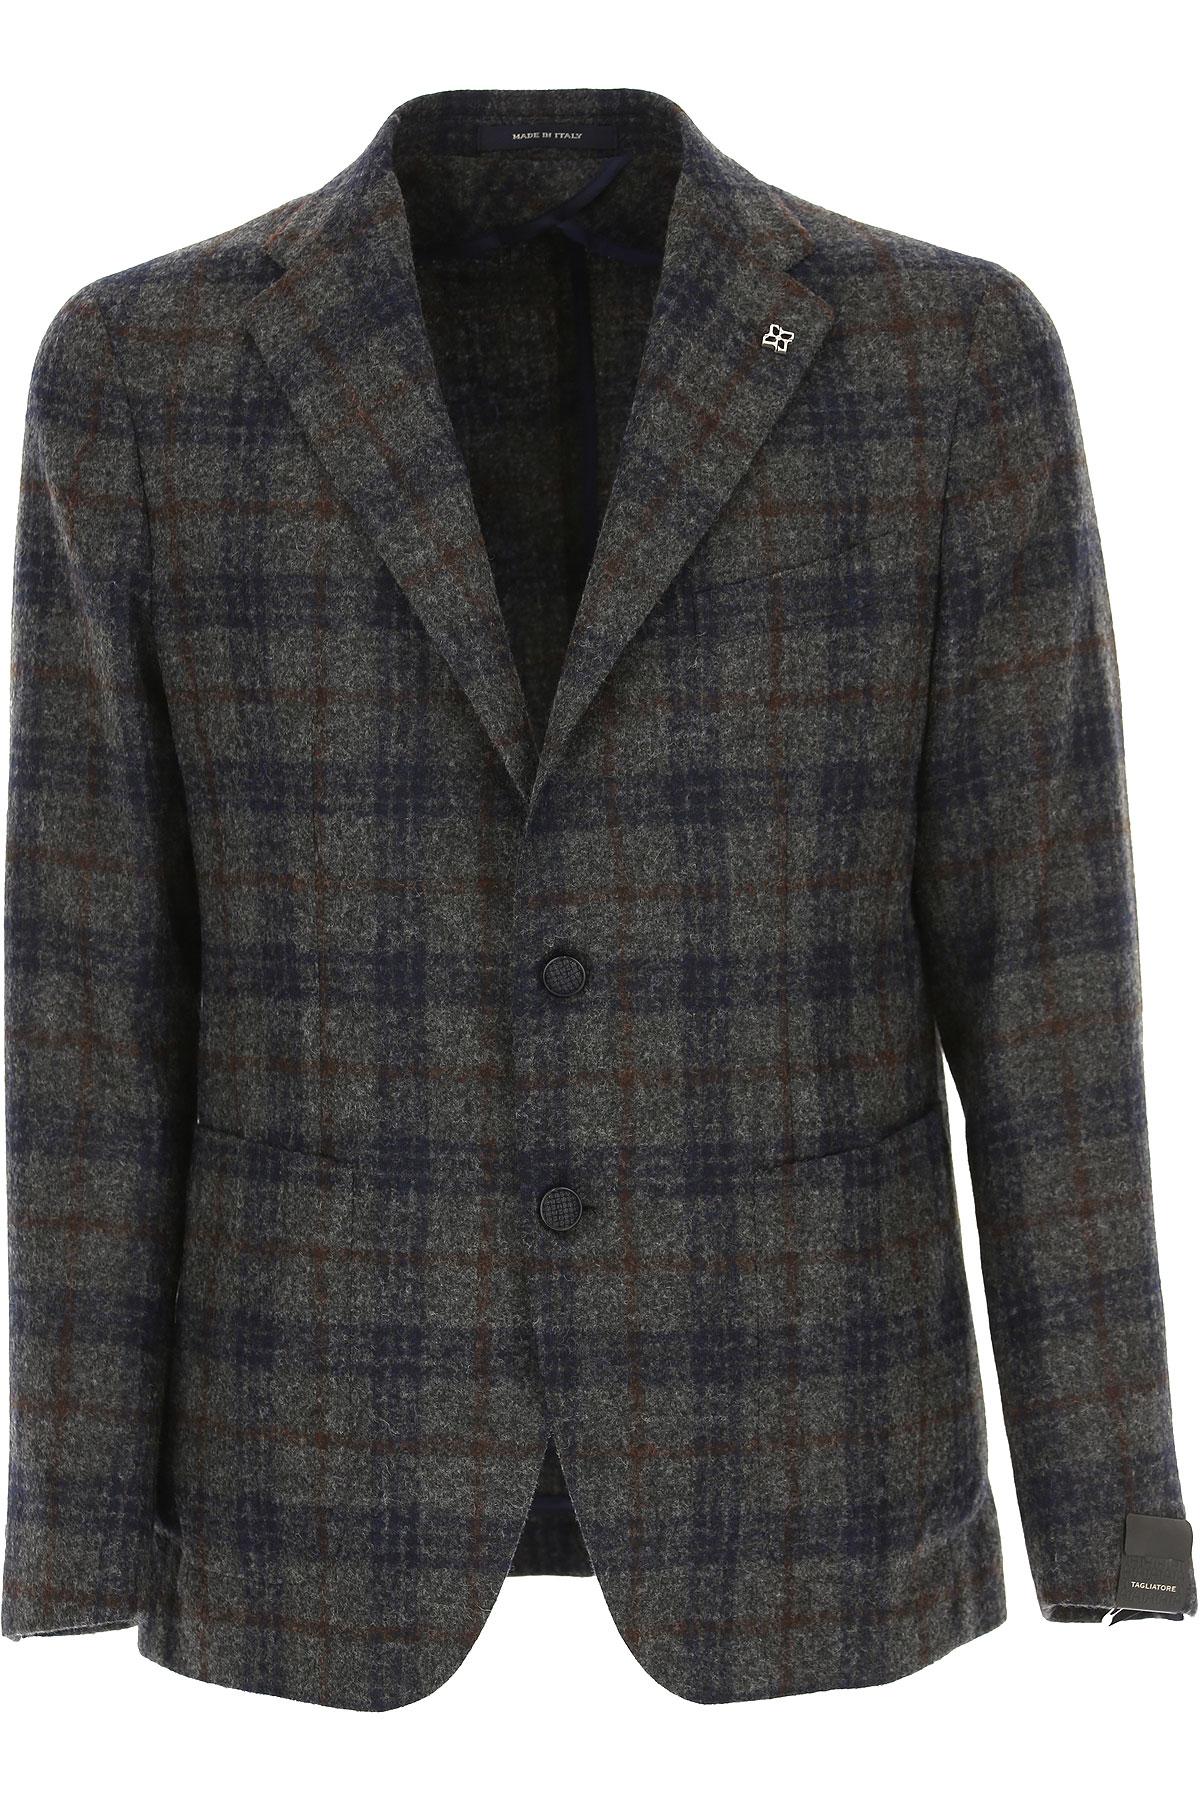 Image of Tagliatore Blazer for Men, Sport Coat, Anthracite, Baby Wool, 2017, L M XL